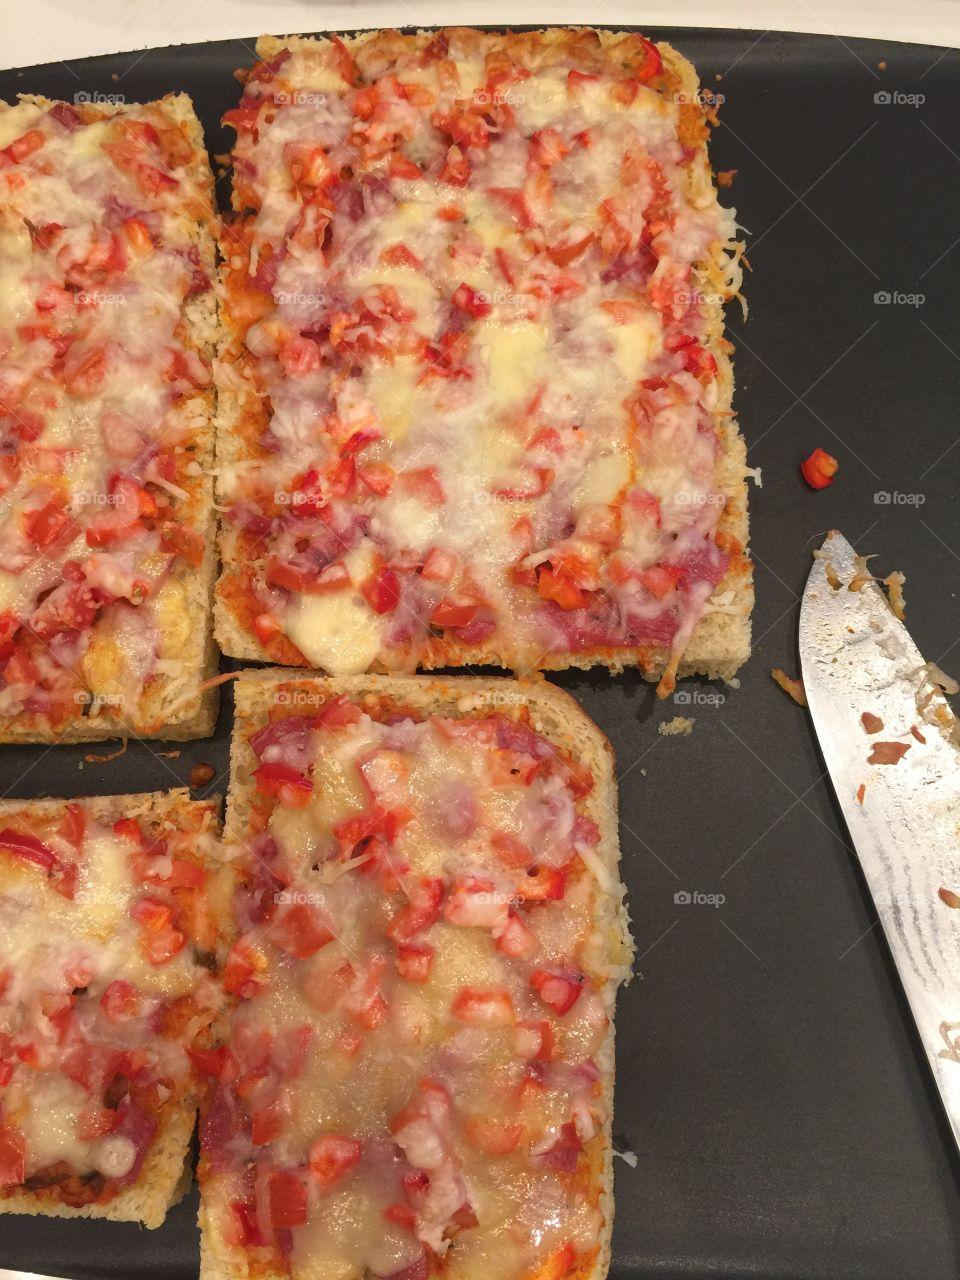 Homemade pizza making